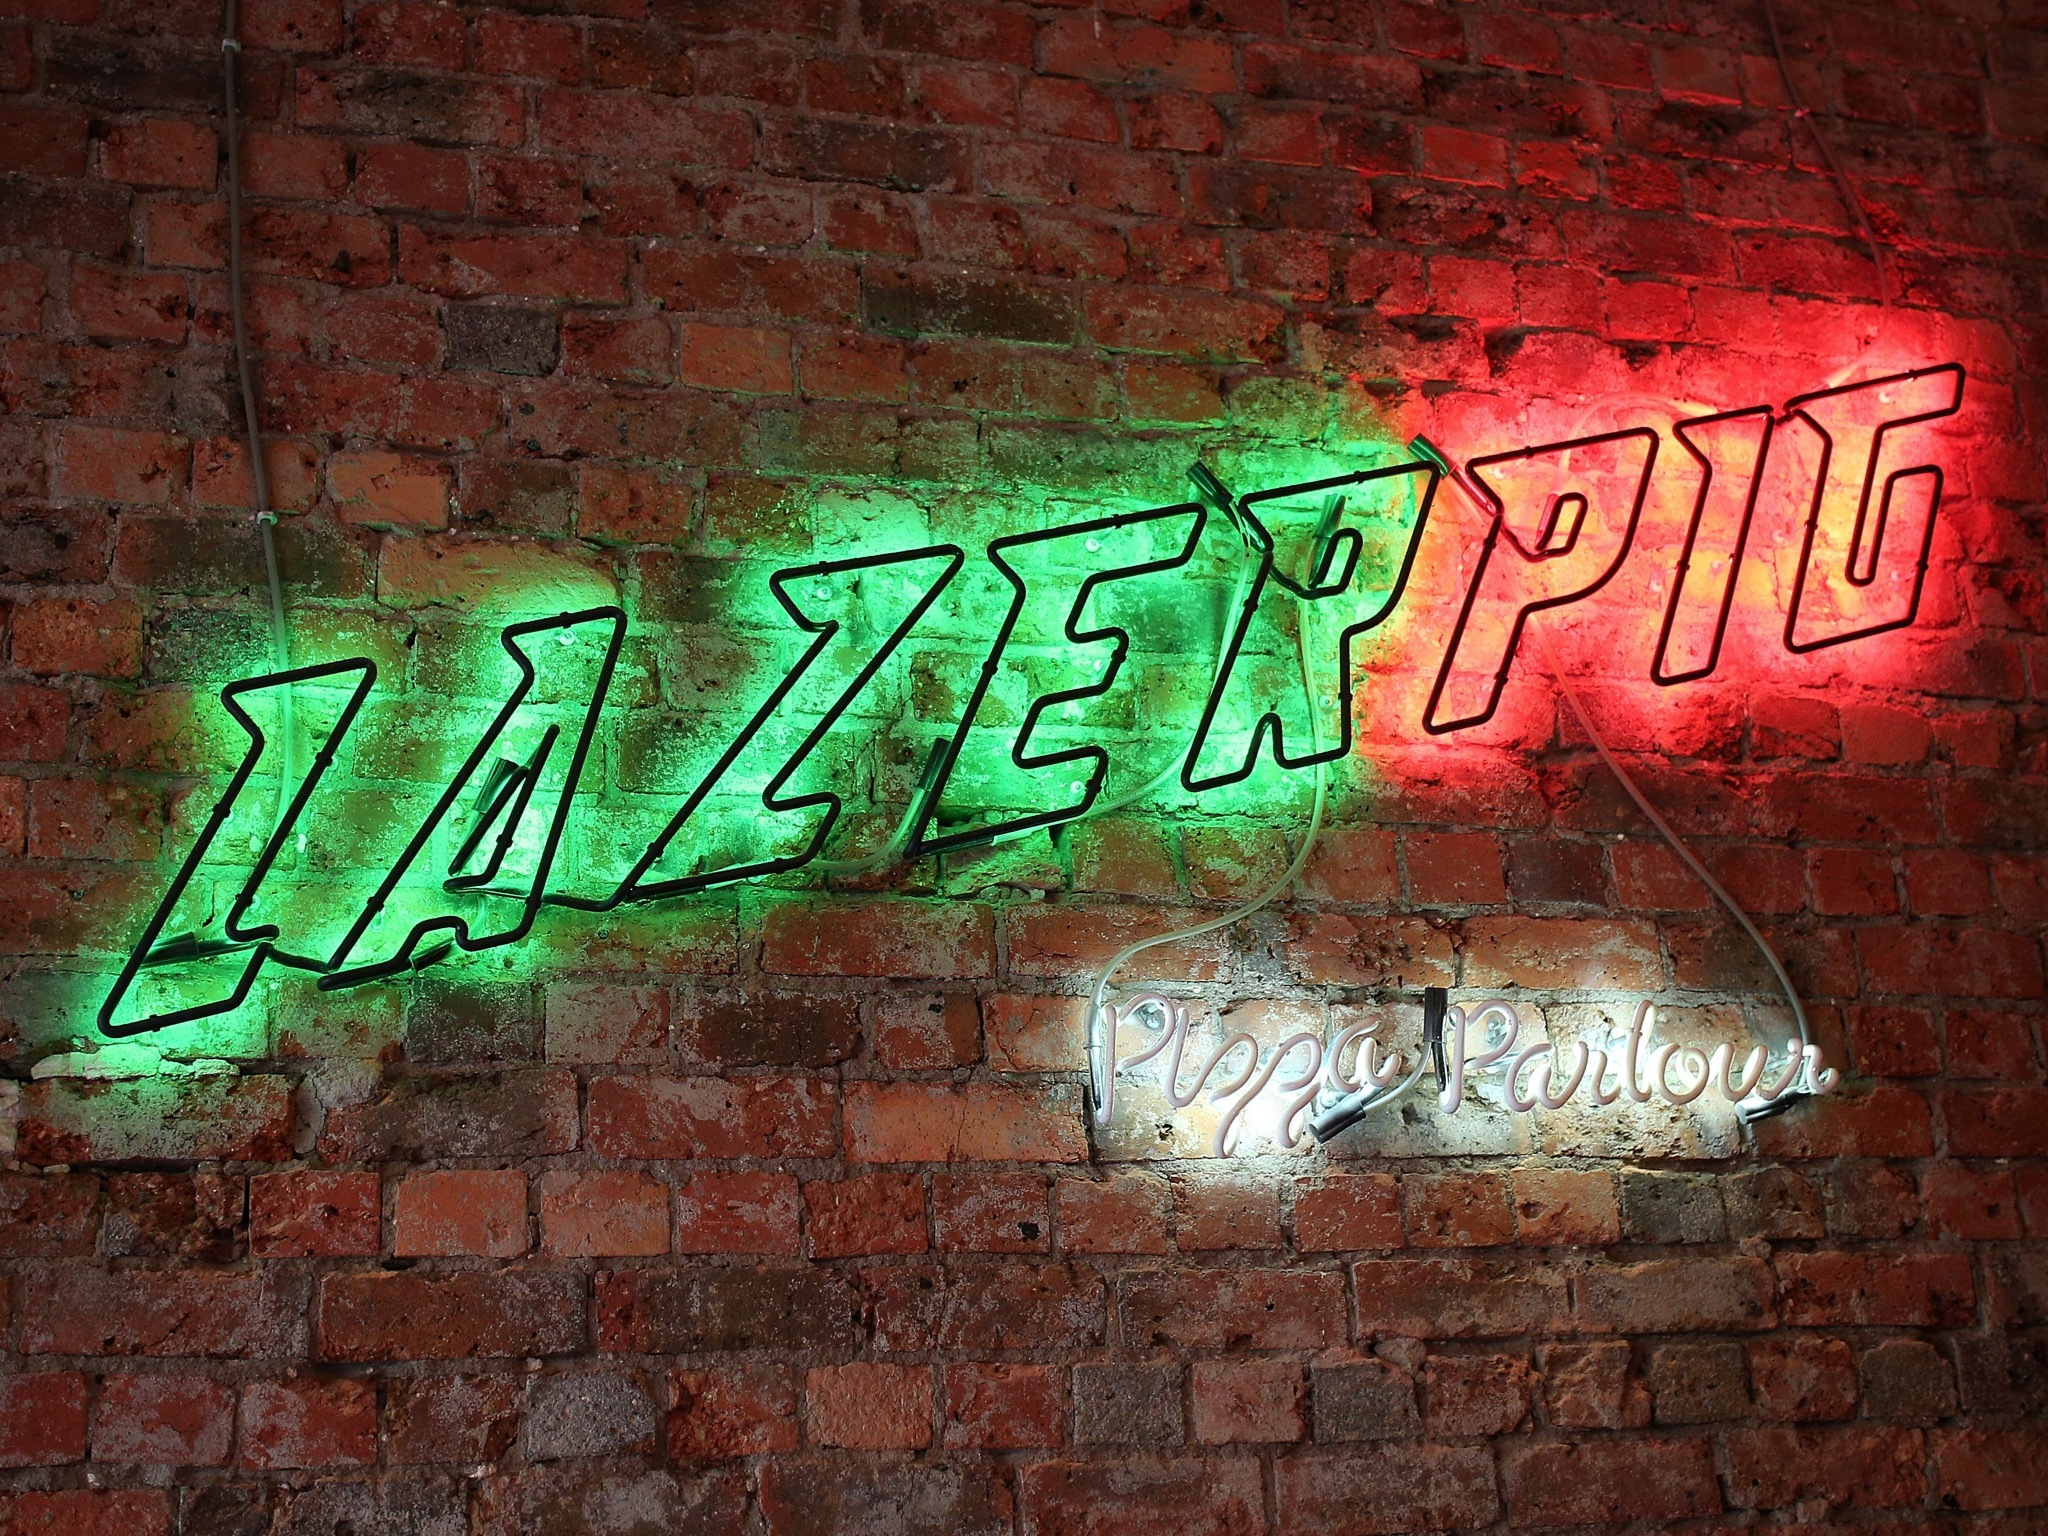 Signage at Lazerpig